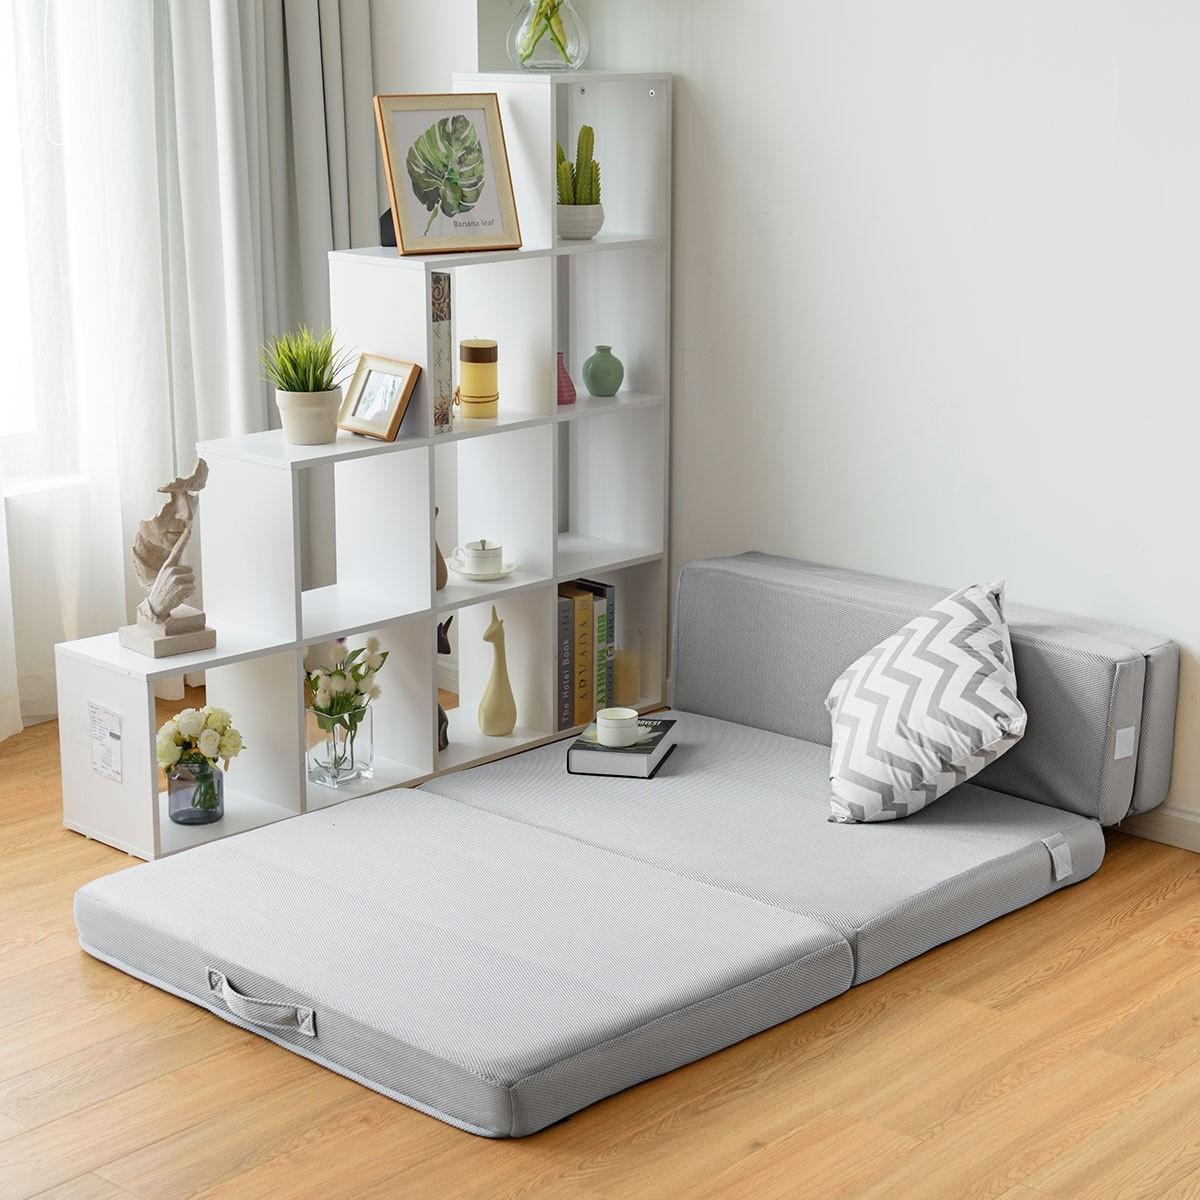 Details About Folding Mattress Sofa Bed Futon Couch Lounger Foam Sleeper Chair Queen Full Twin